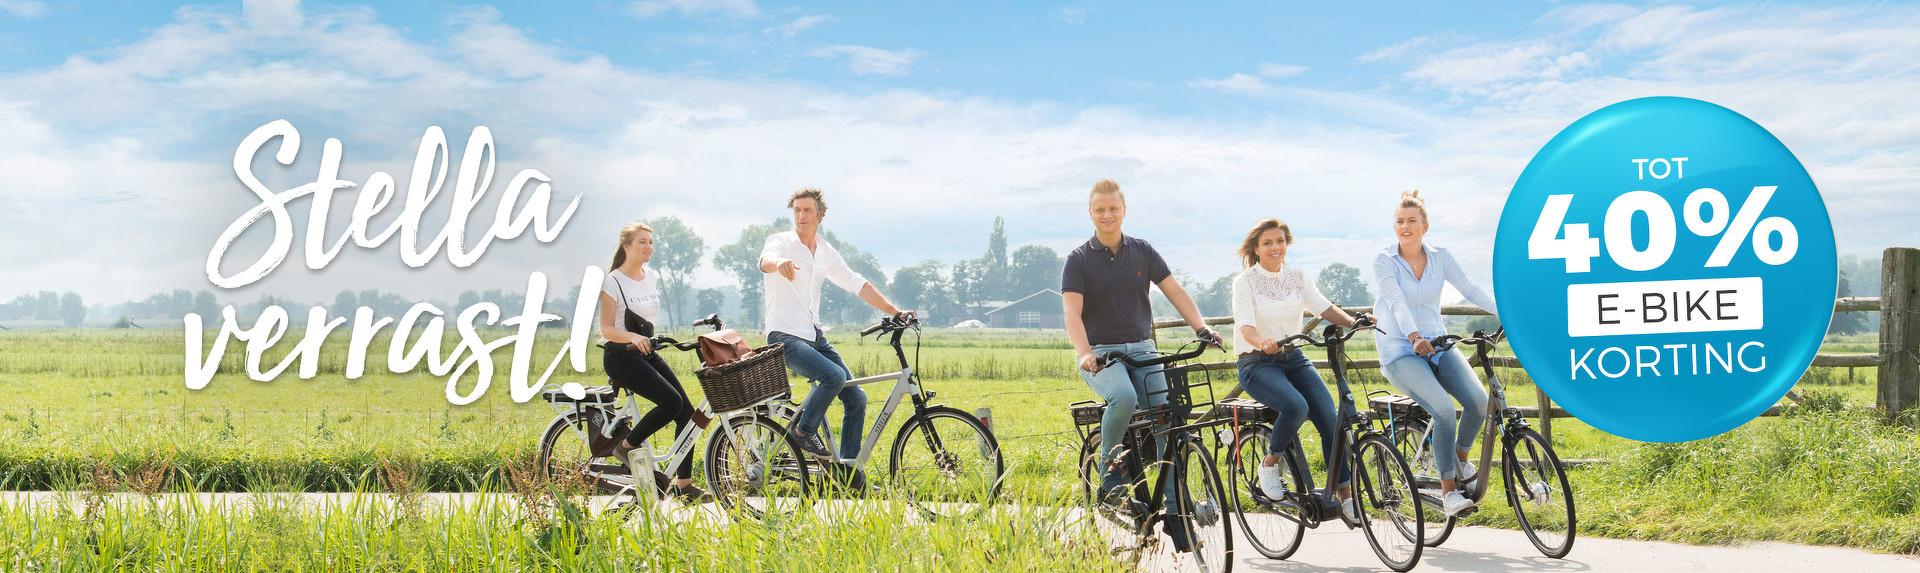 Stella Verrast - Verrassingskorting tot 40% op alle Stella e-bikes!